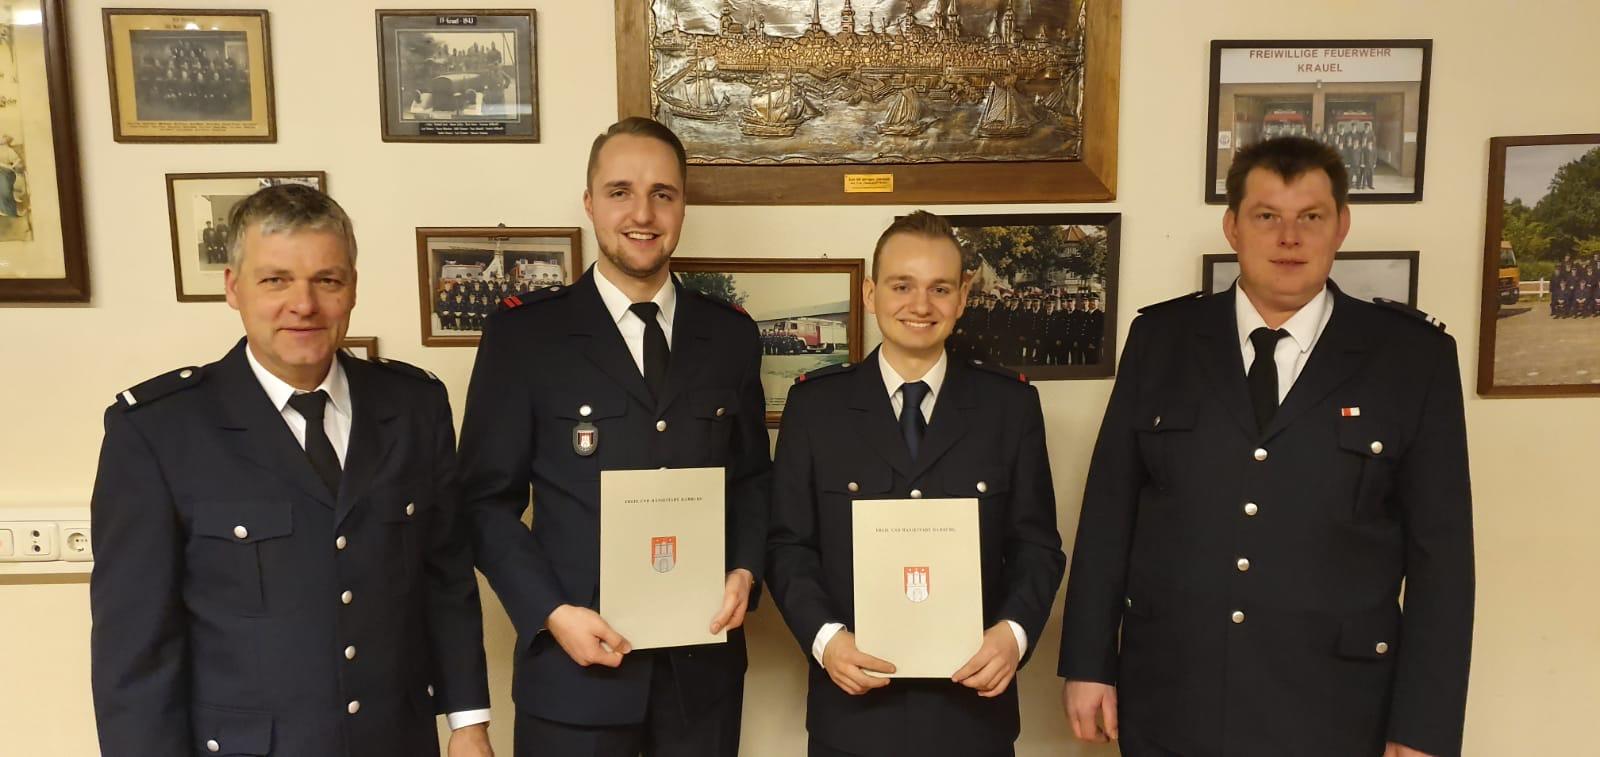 WF/V R.Hevers, OFM K.Glasow, FM L. Sander, WF T. Putfarcken